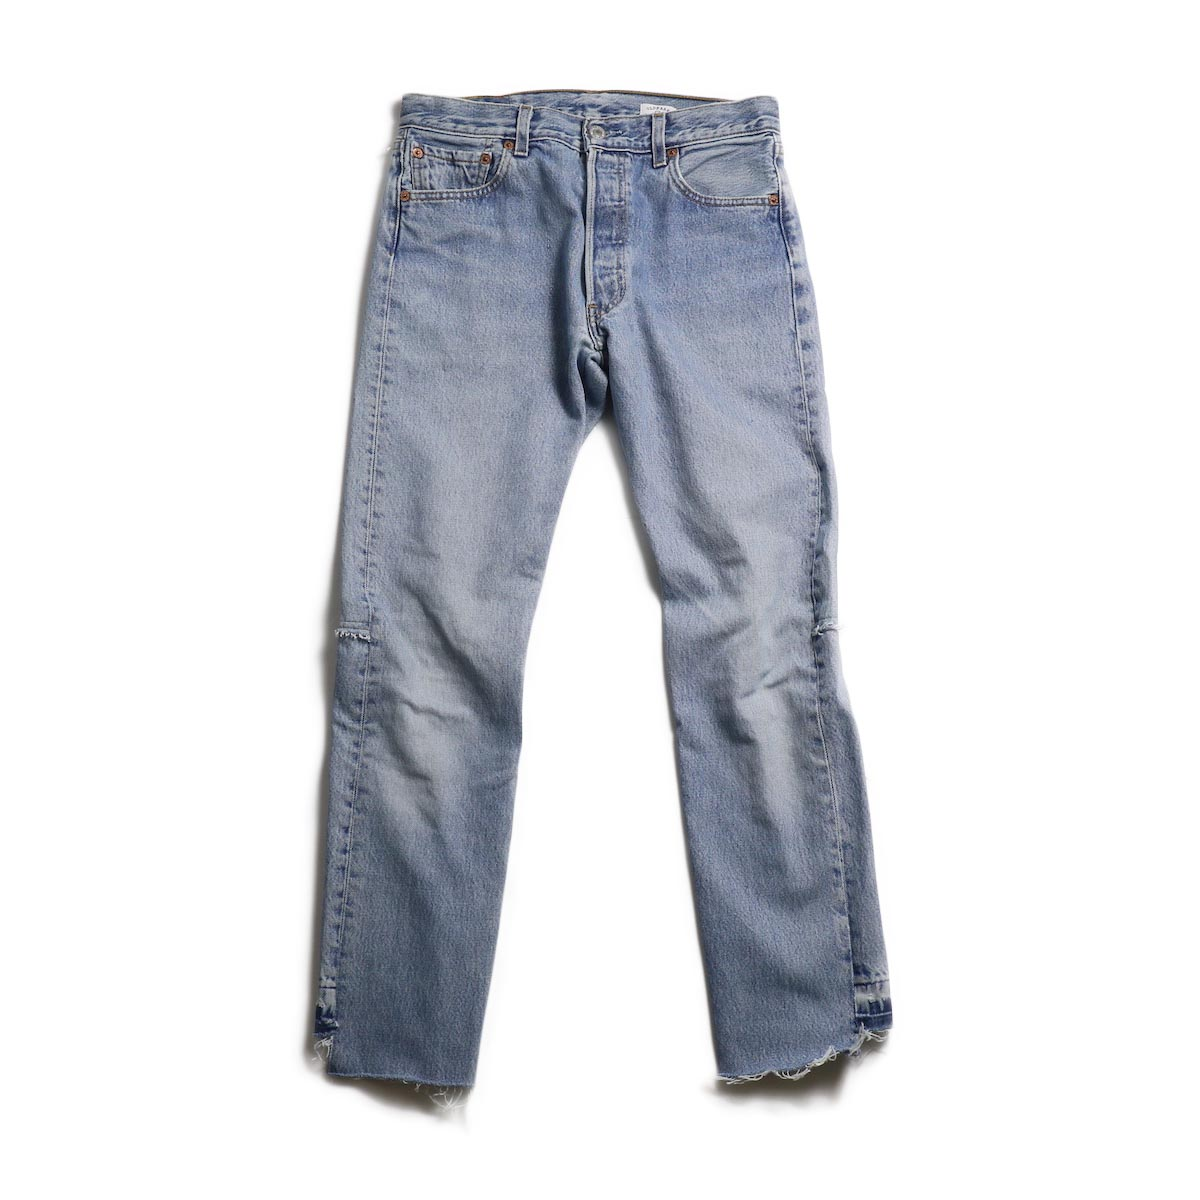 OLD PARK / Back Flare Jeans -Blue Ssize (C)